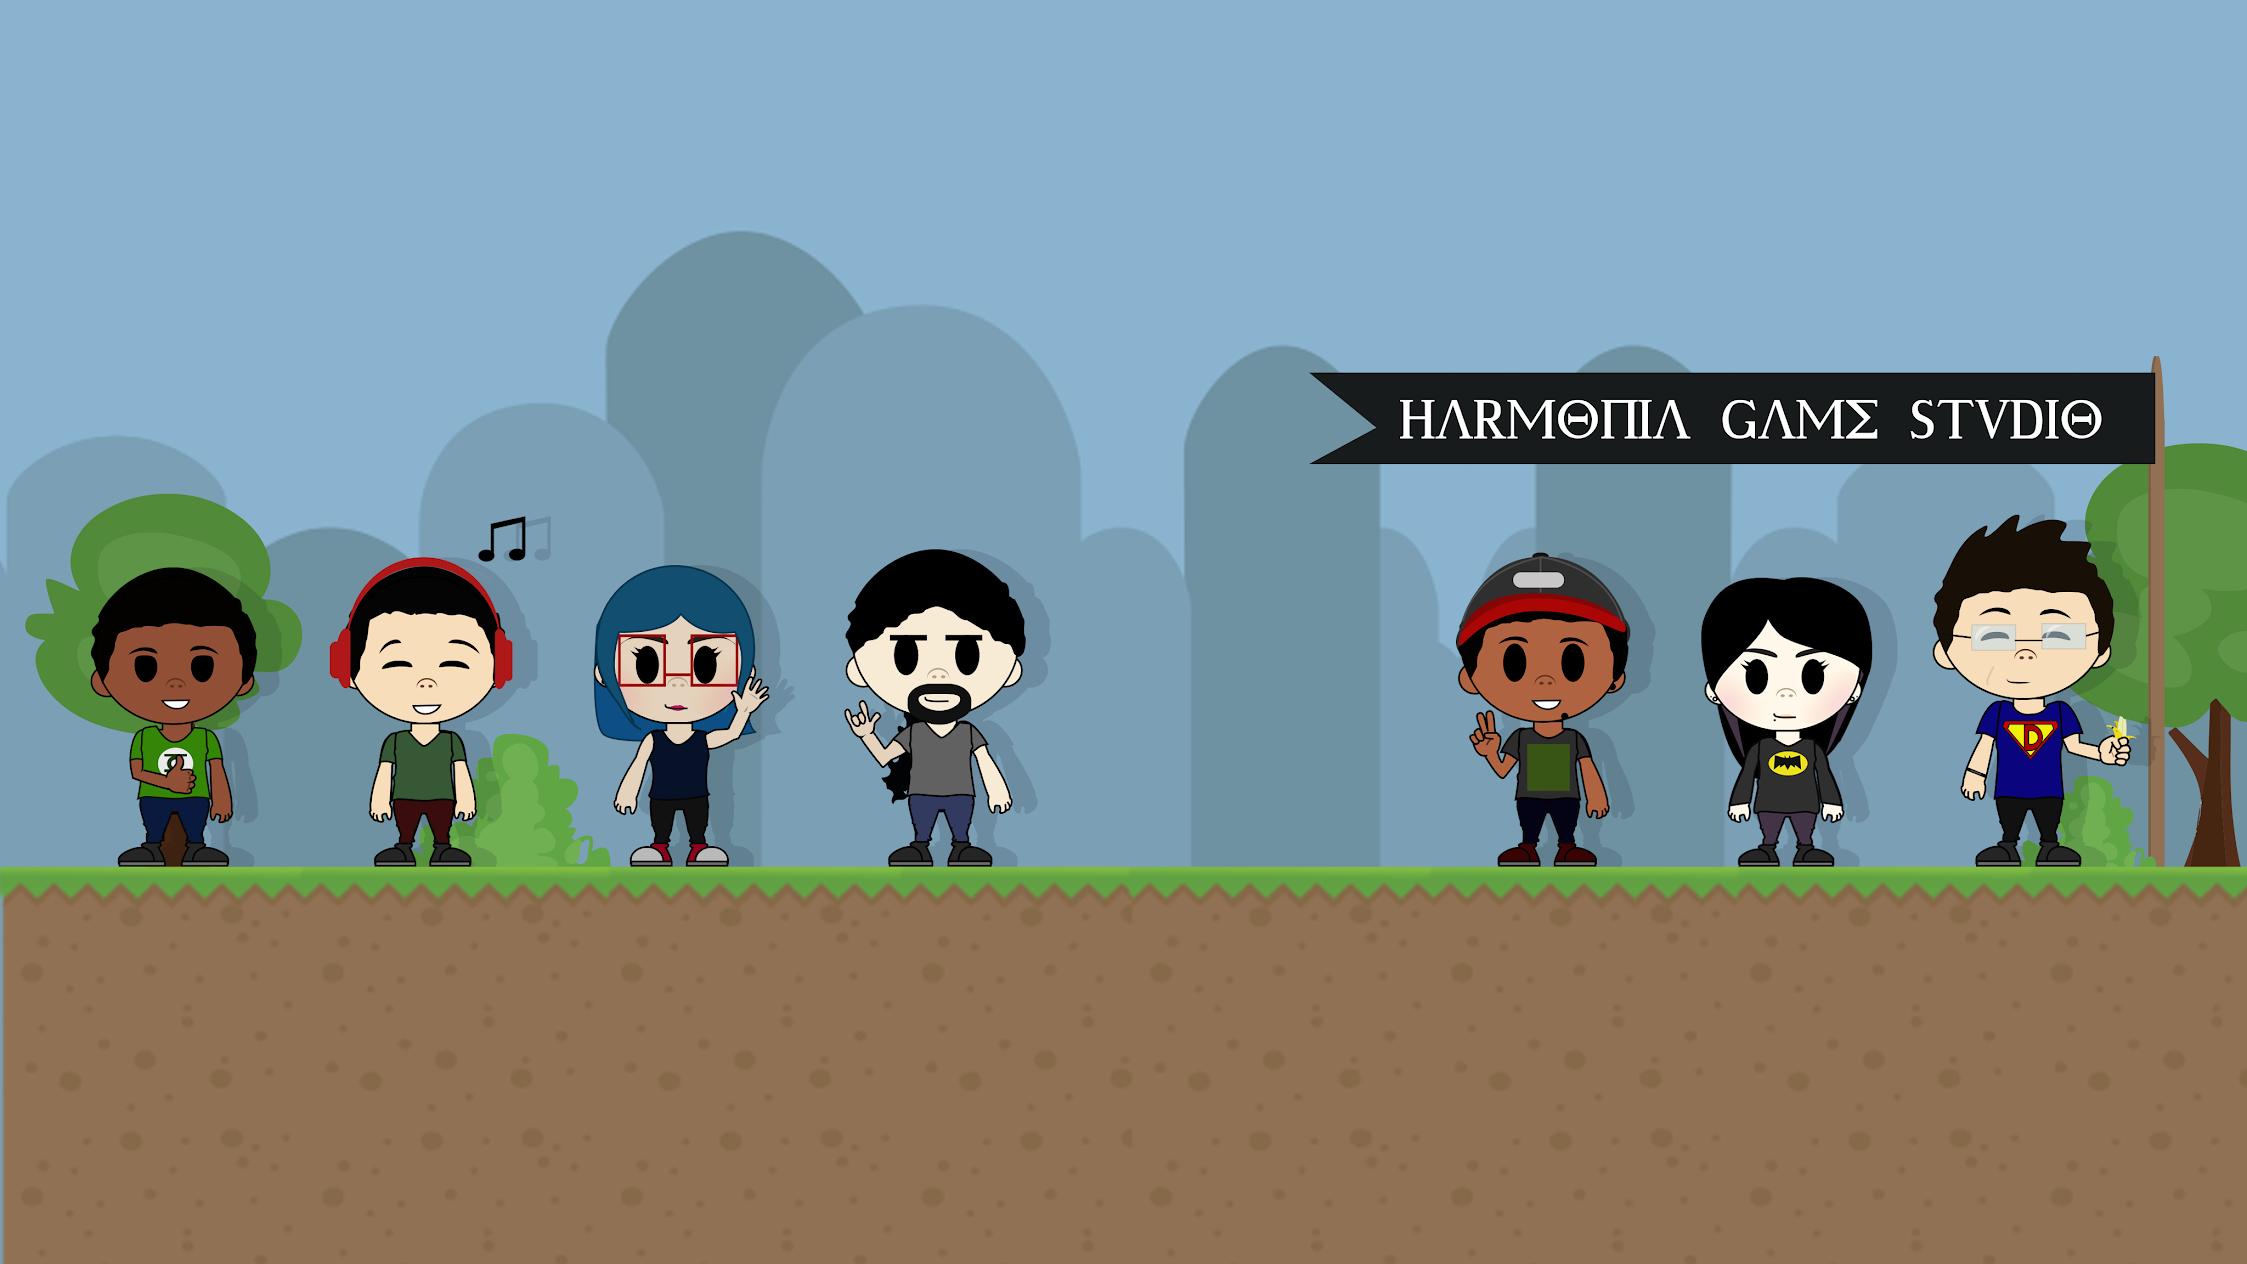 Harmonia Game Studio